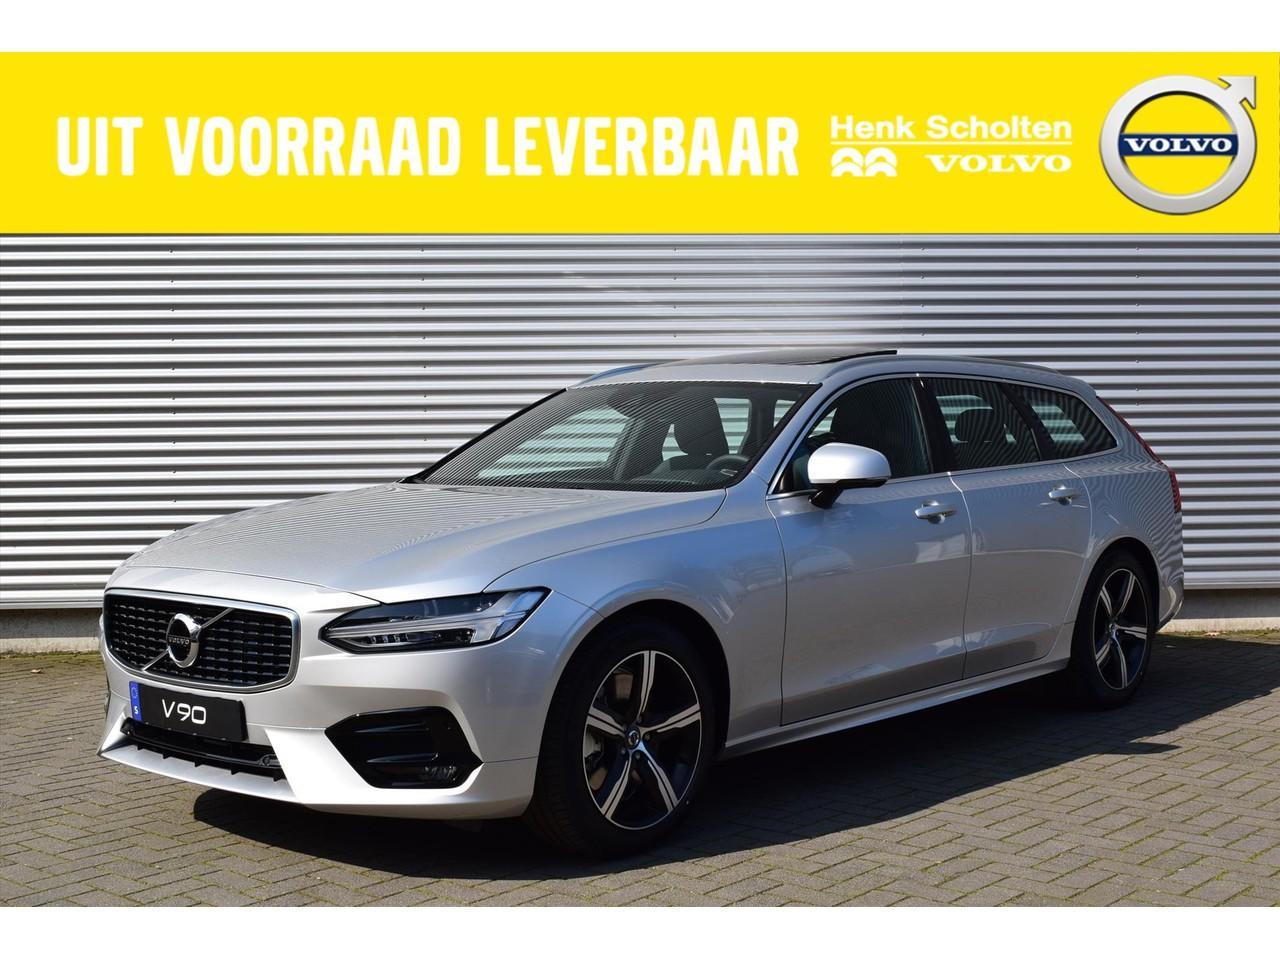 Volvo V90 T4 190pk business sport luxury scandinavian line